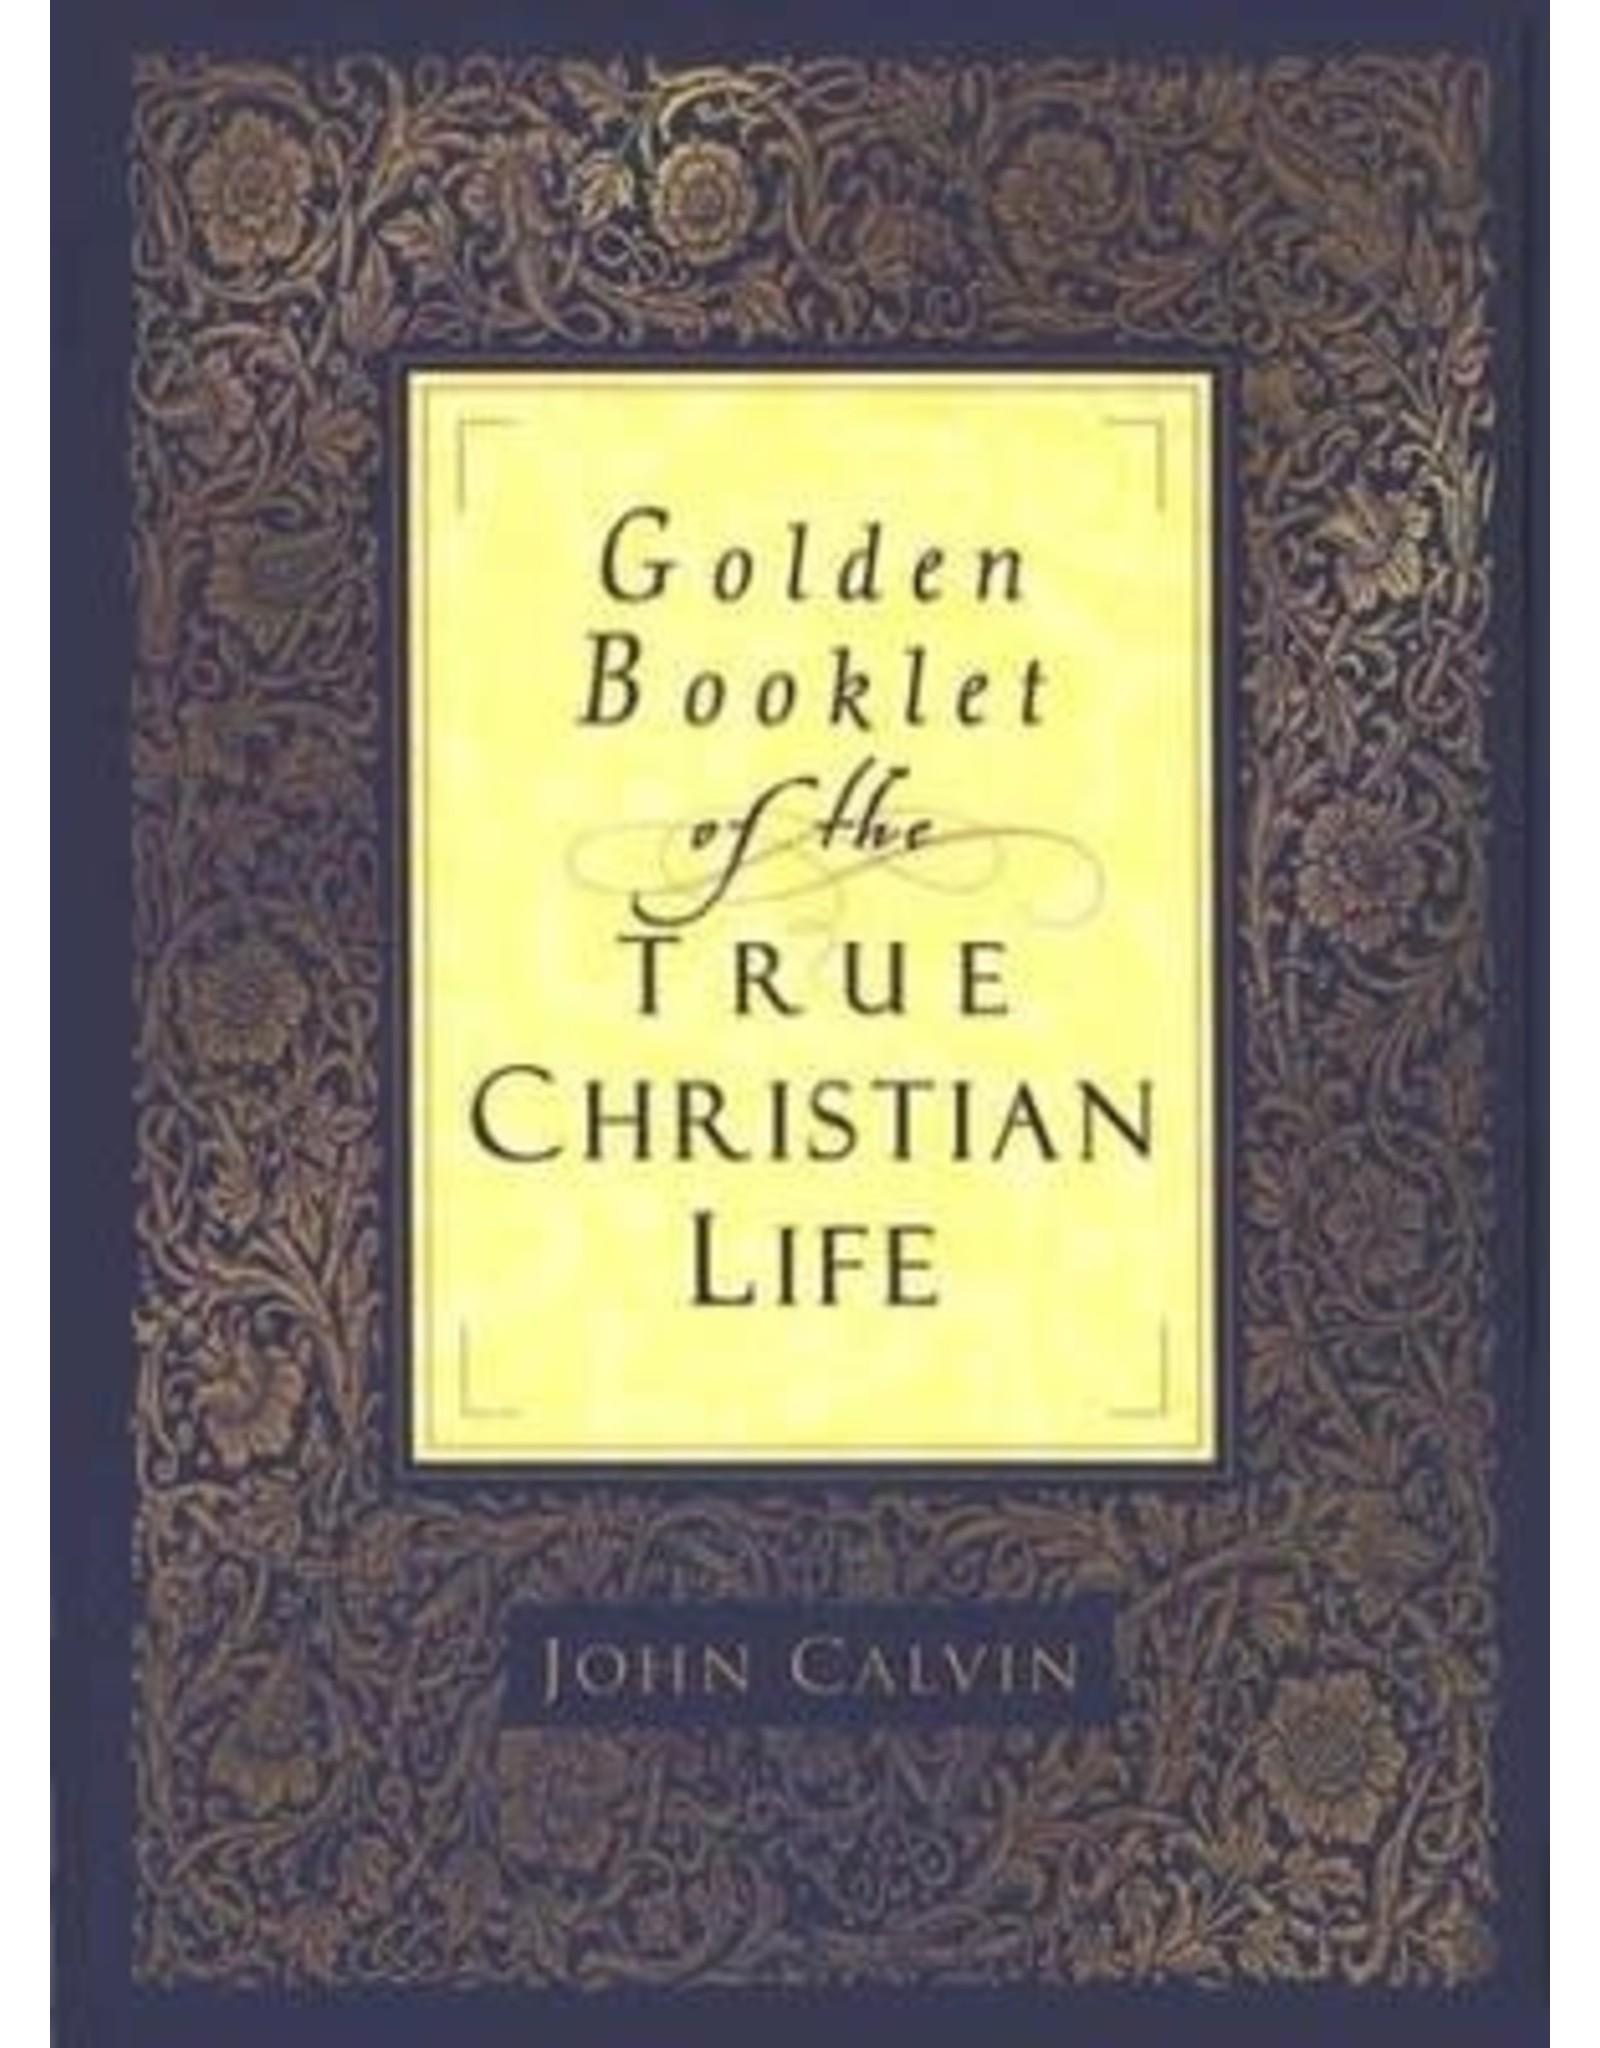 Golden Booklet by John Calvin